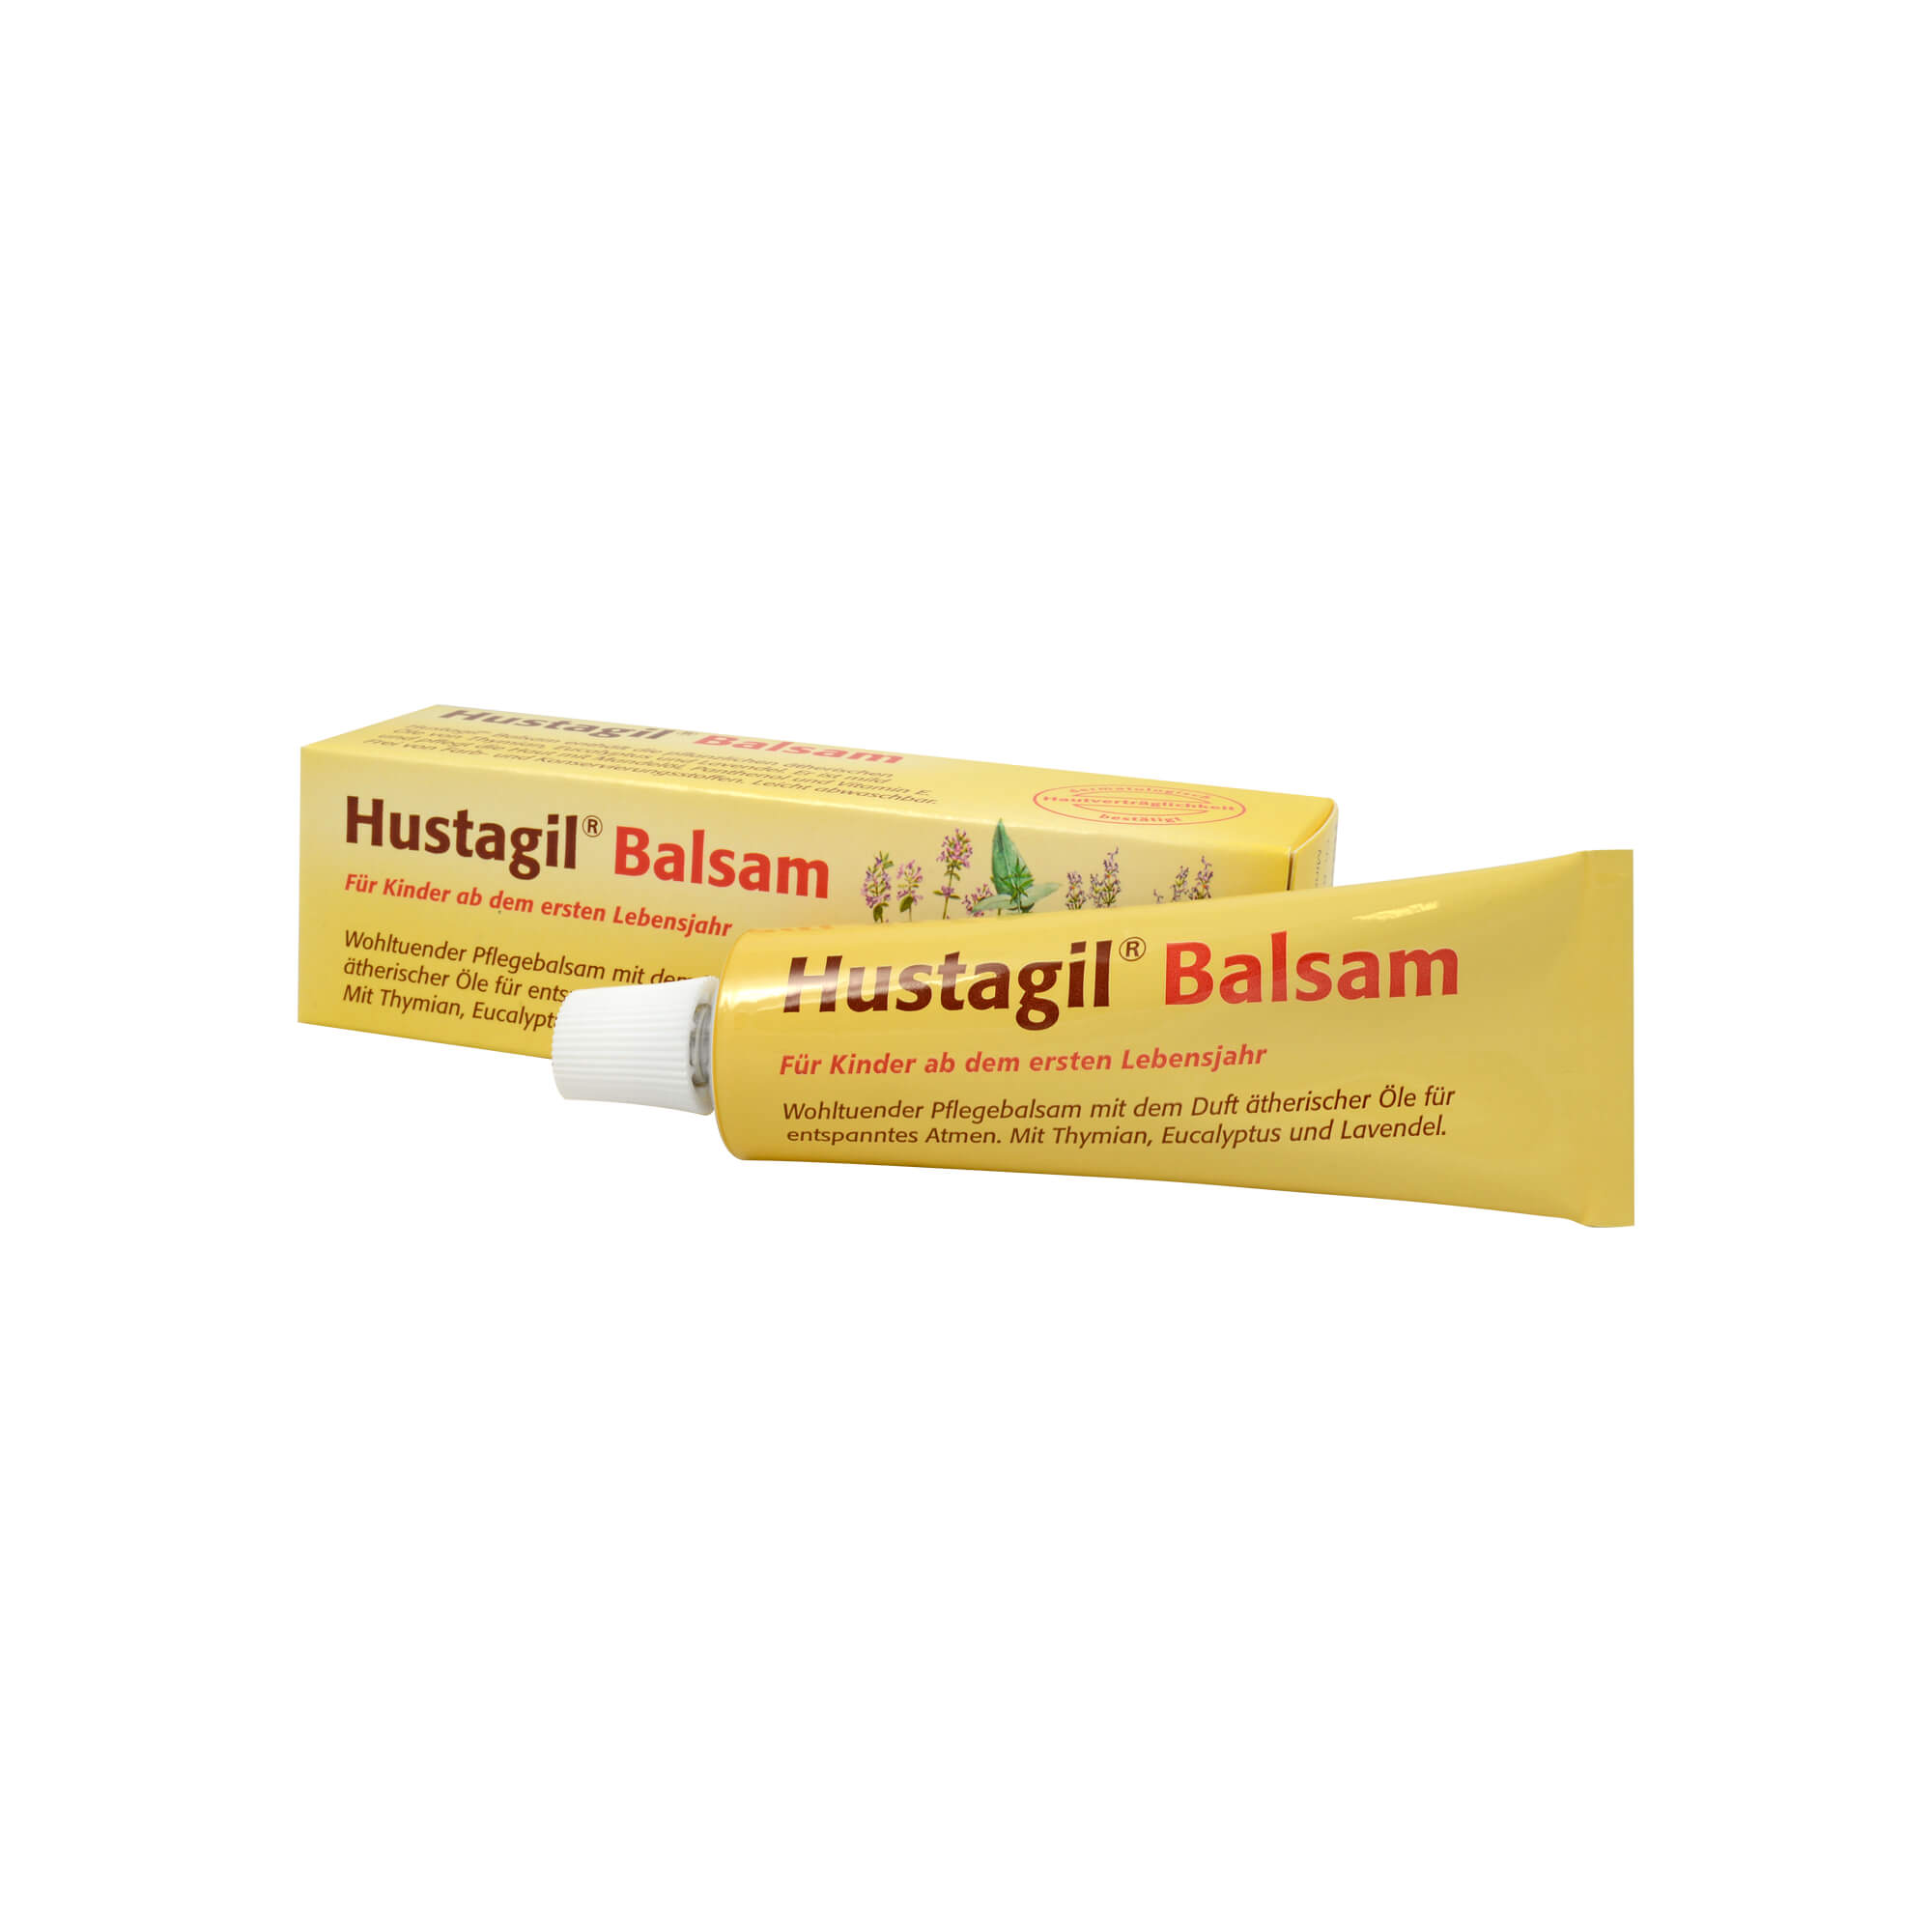 Hustagil Balsam